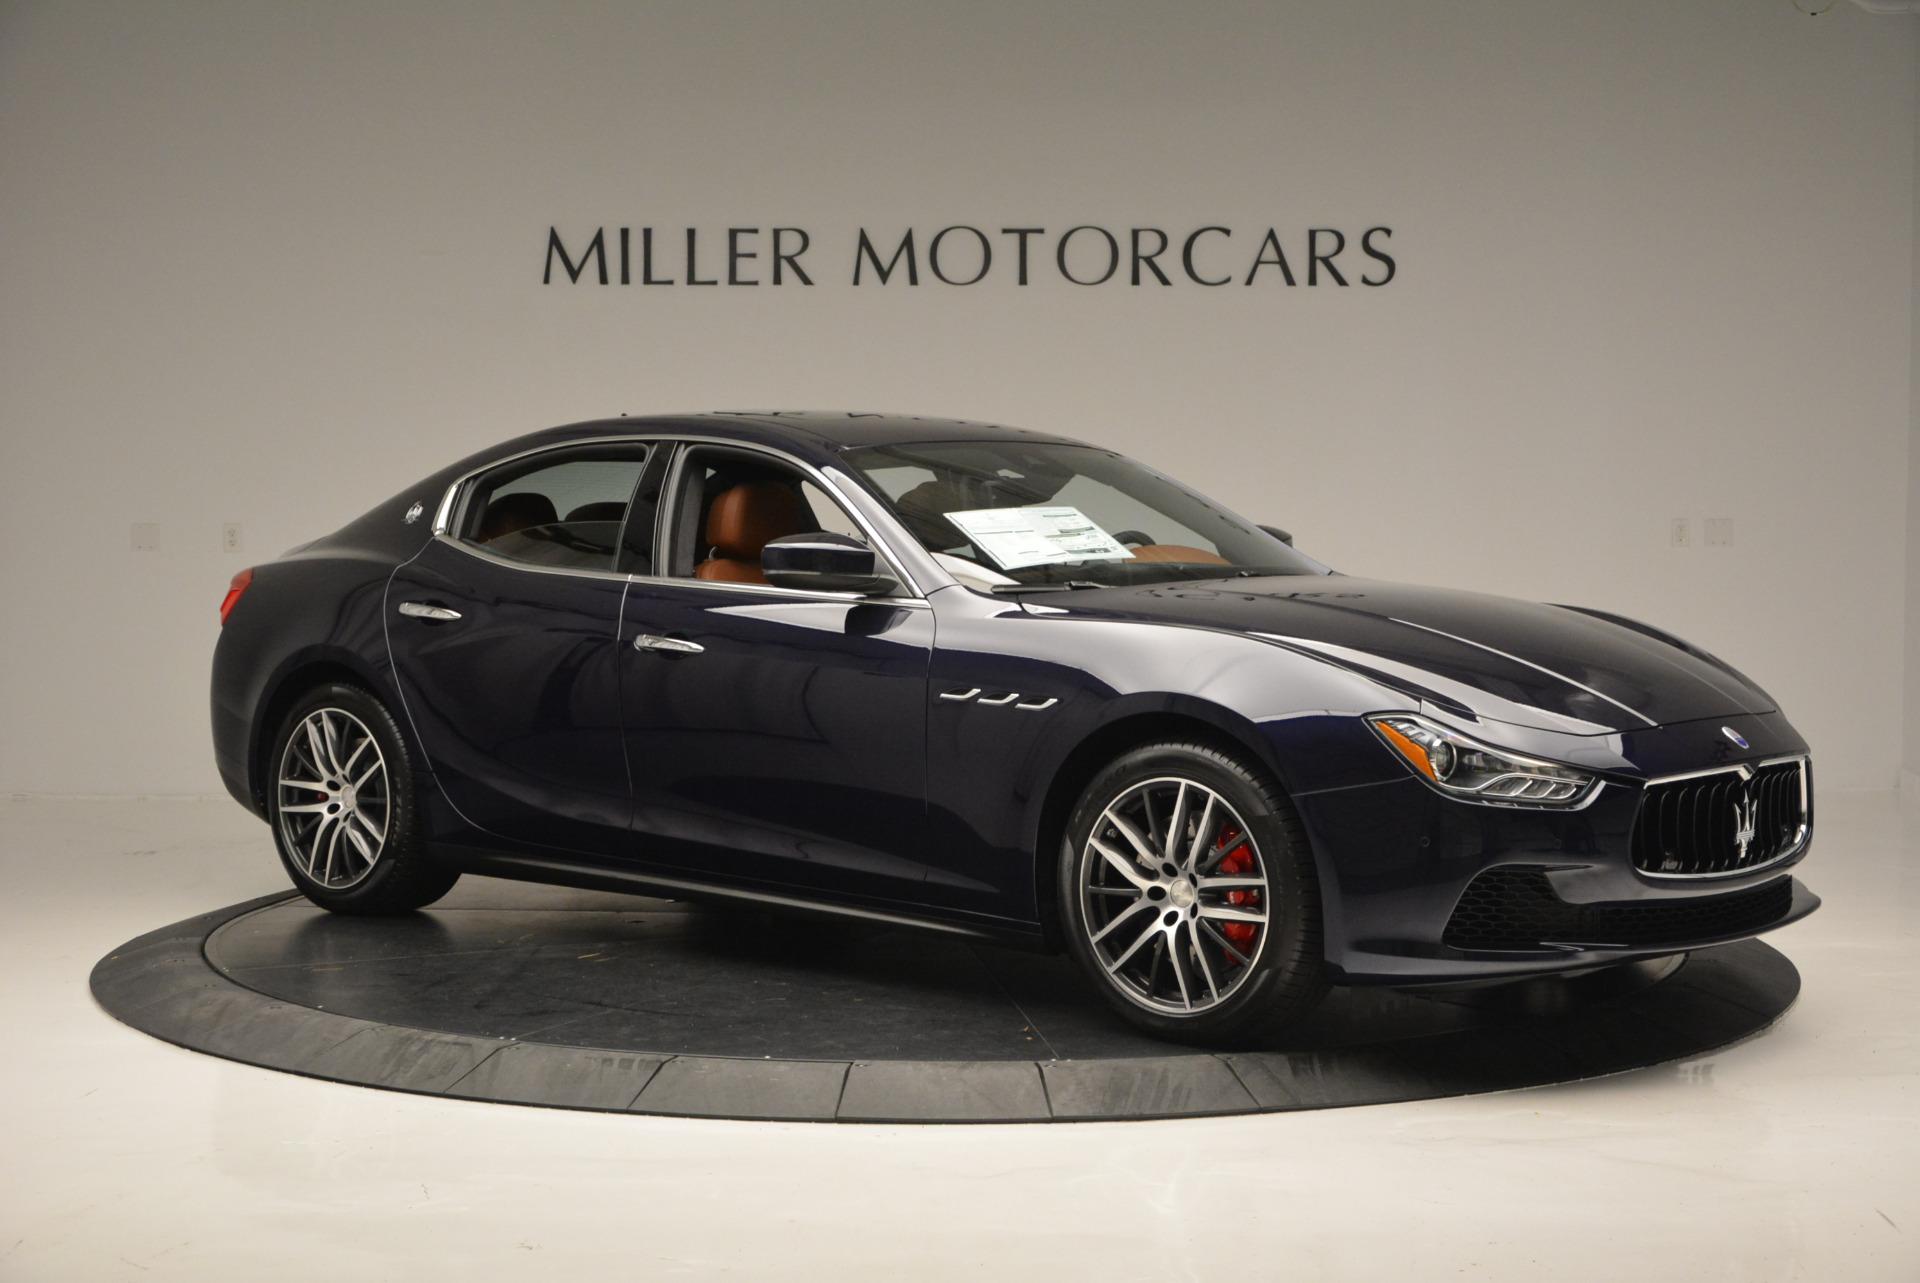 Used 2017 Maserati Ghibli S Q4 - EX Loaner For Sale In Greenwich, CT. Alfa Romeo of Greenwich, M1656 567_p10